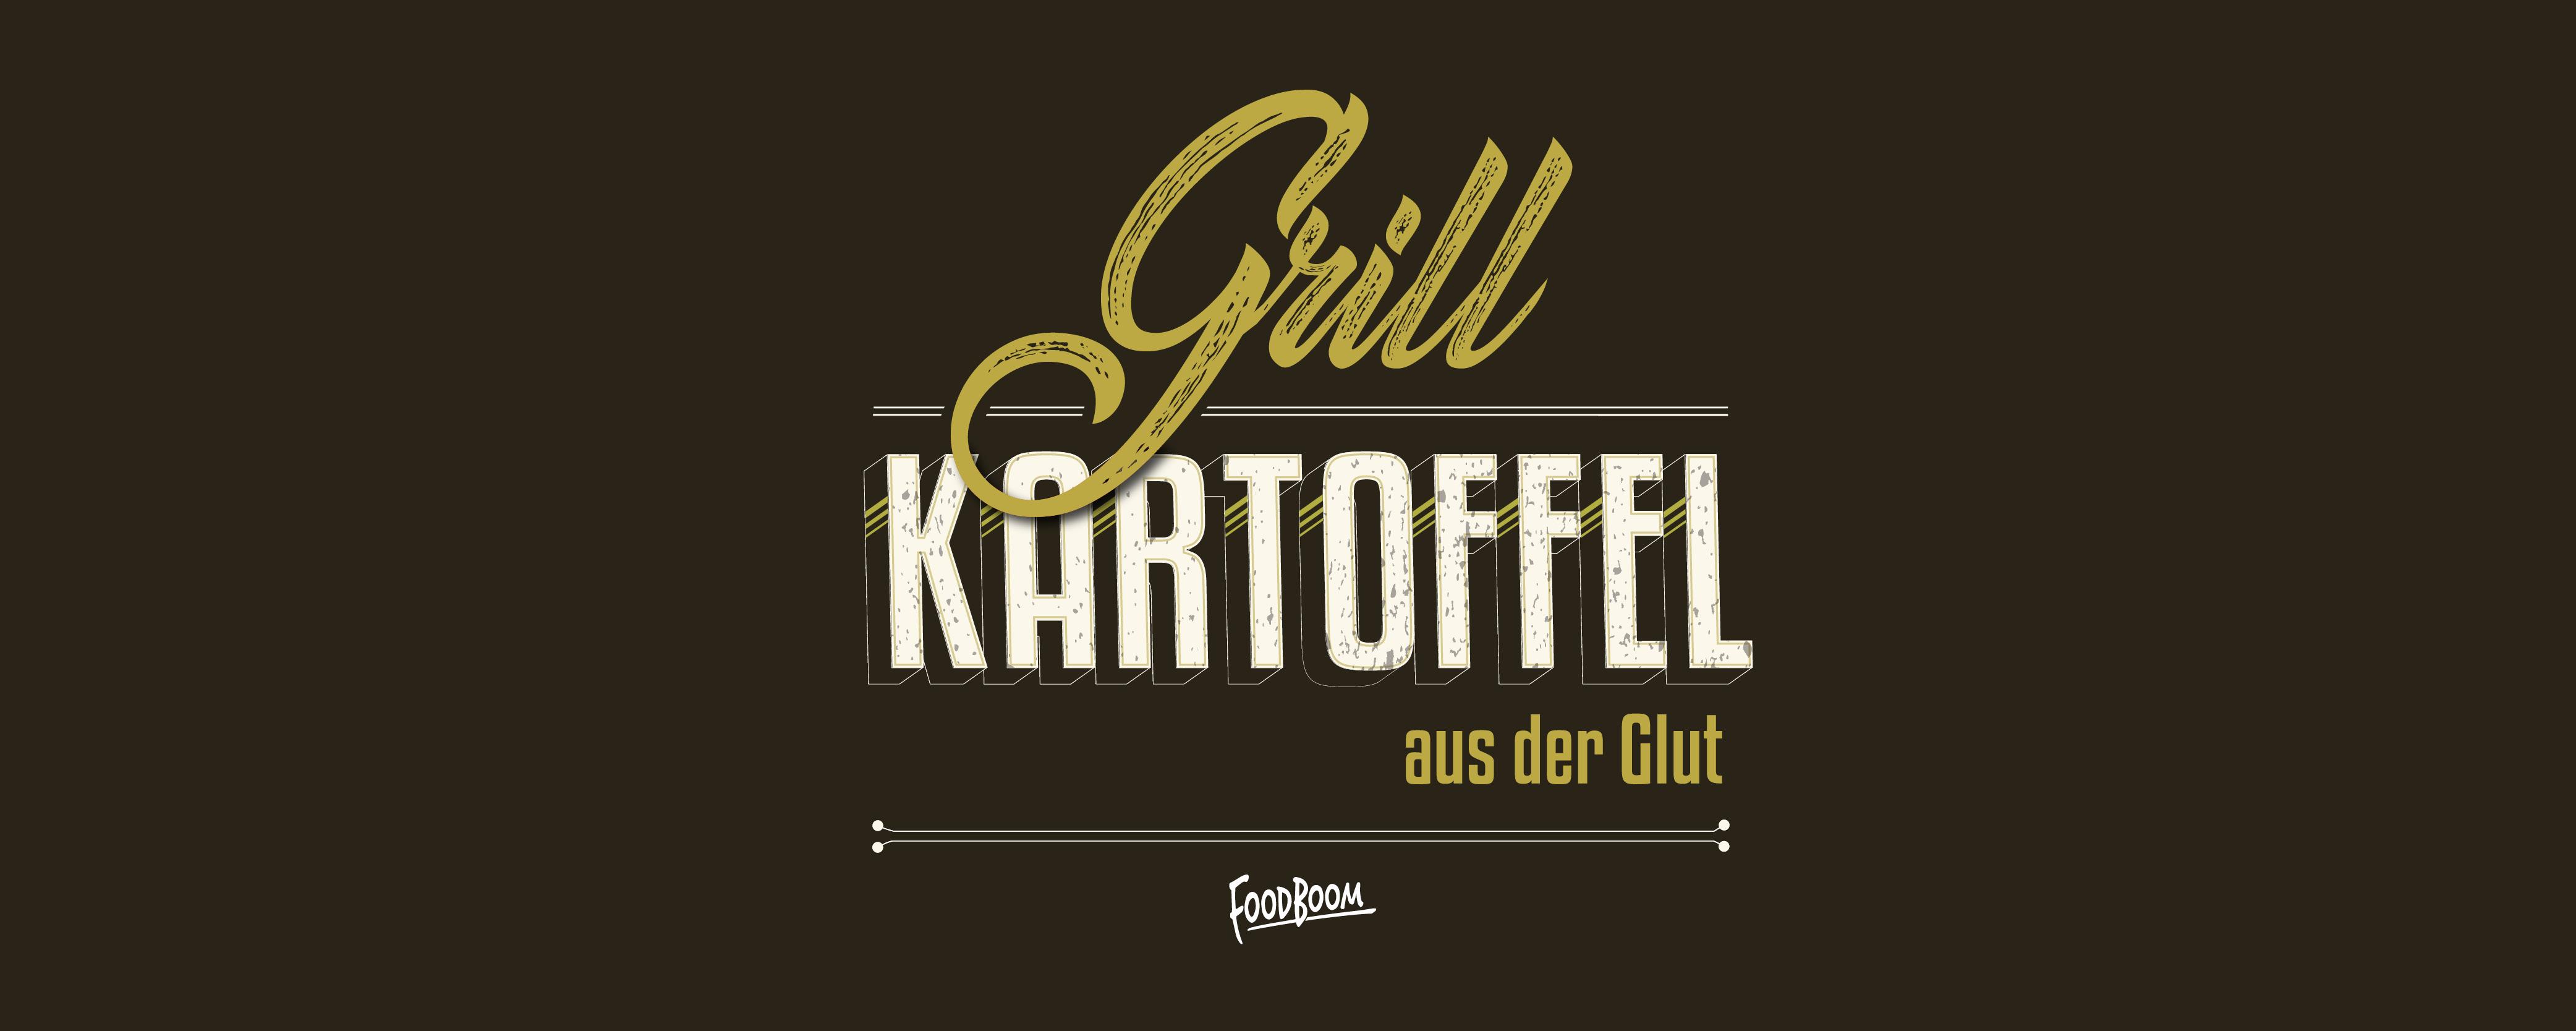 Jack Daniels Illustration Layout Typografie Grill Kartoffel | Grafik Design Freelancer Berlin